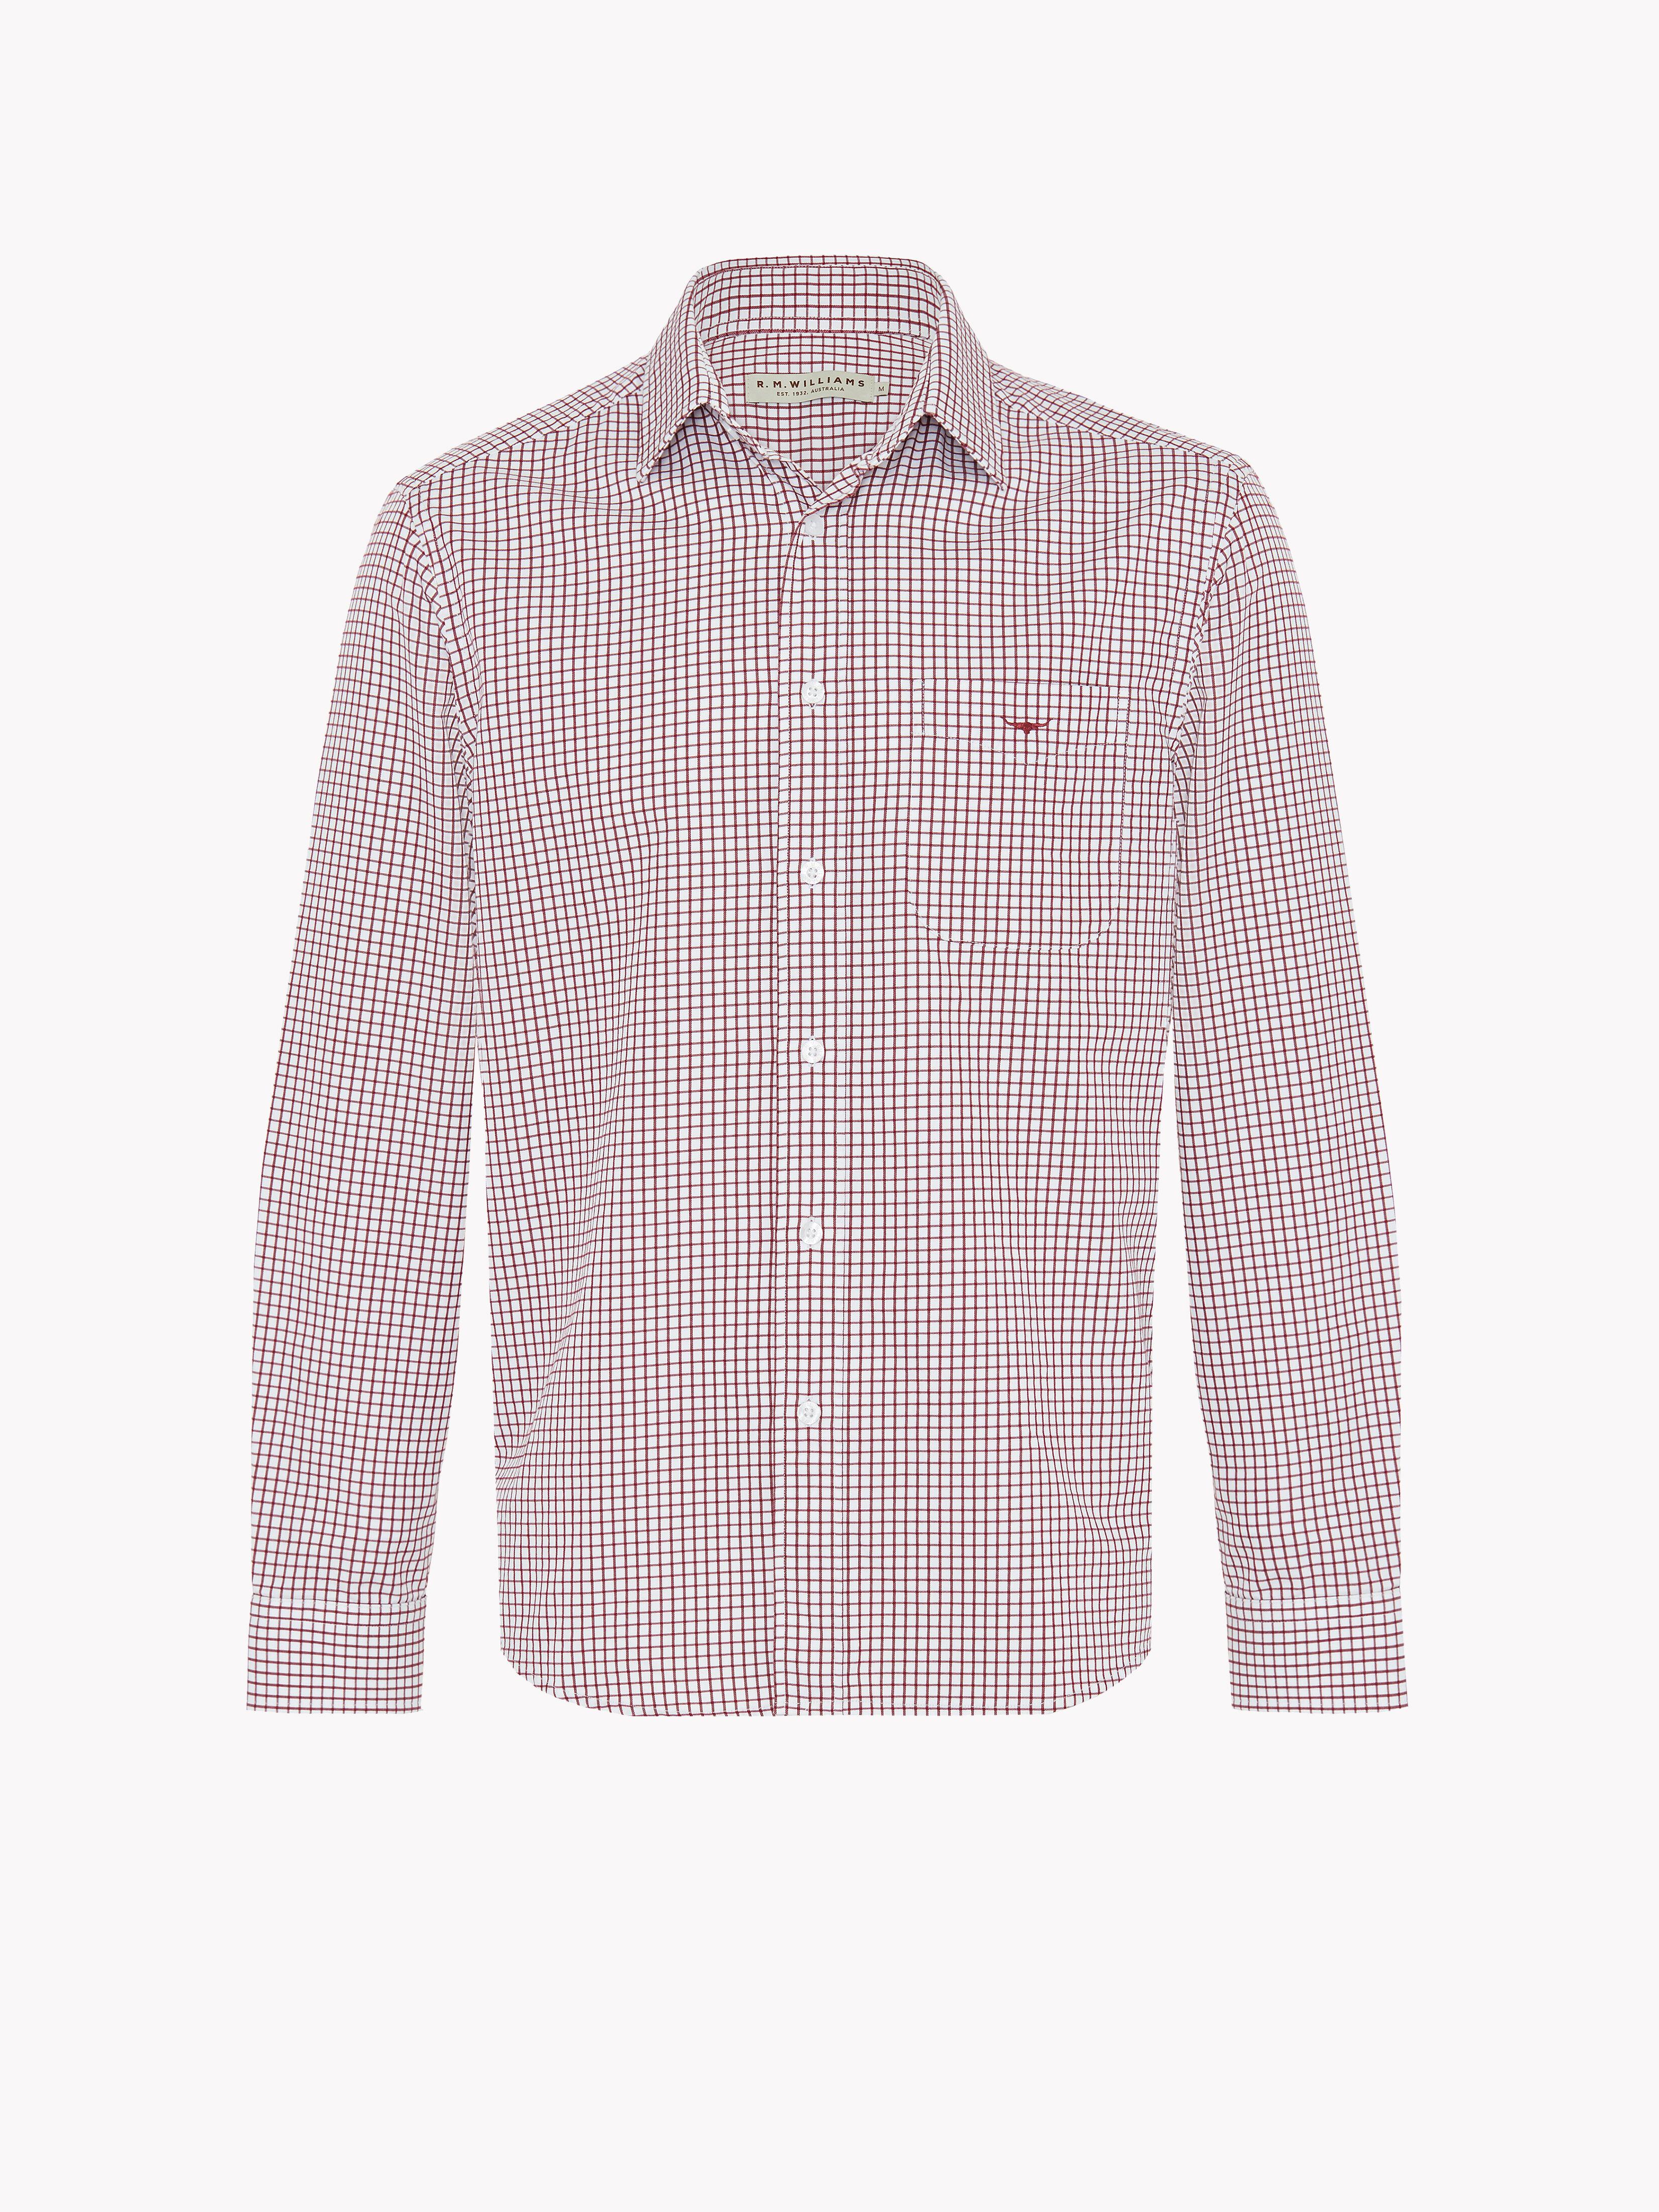 Collins Shirt - Men's Shirts at R.M